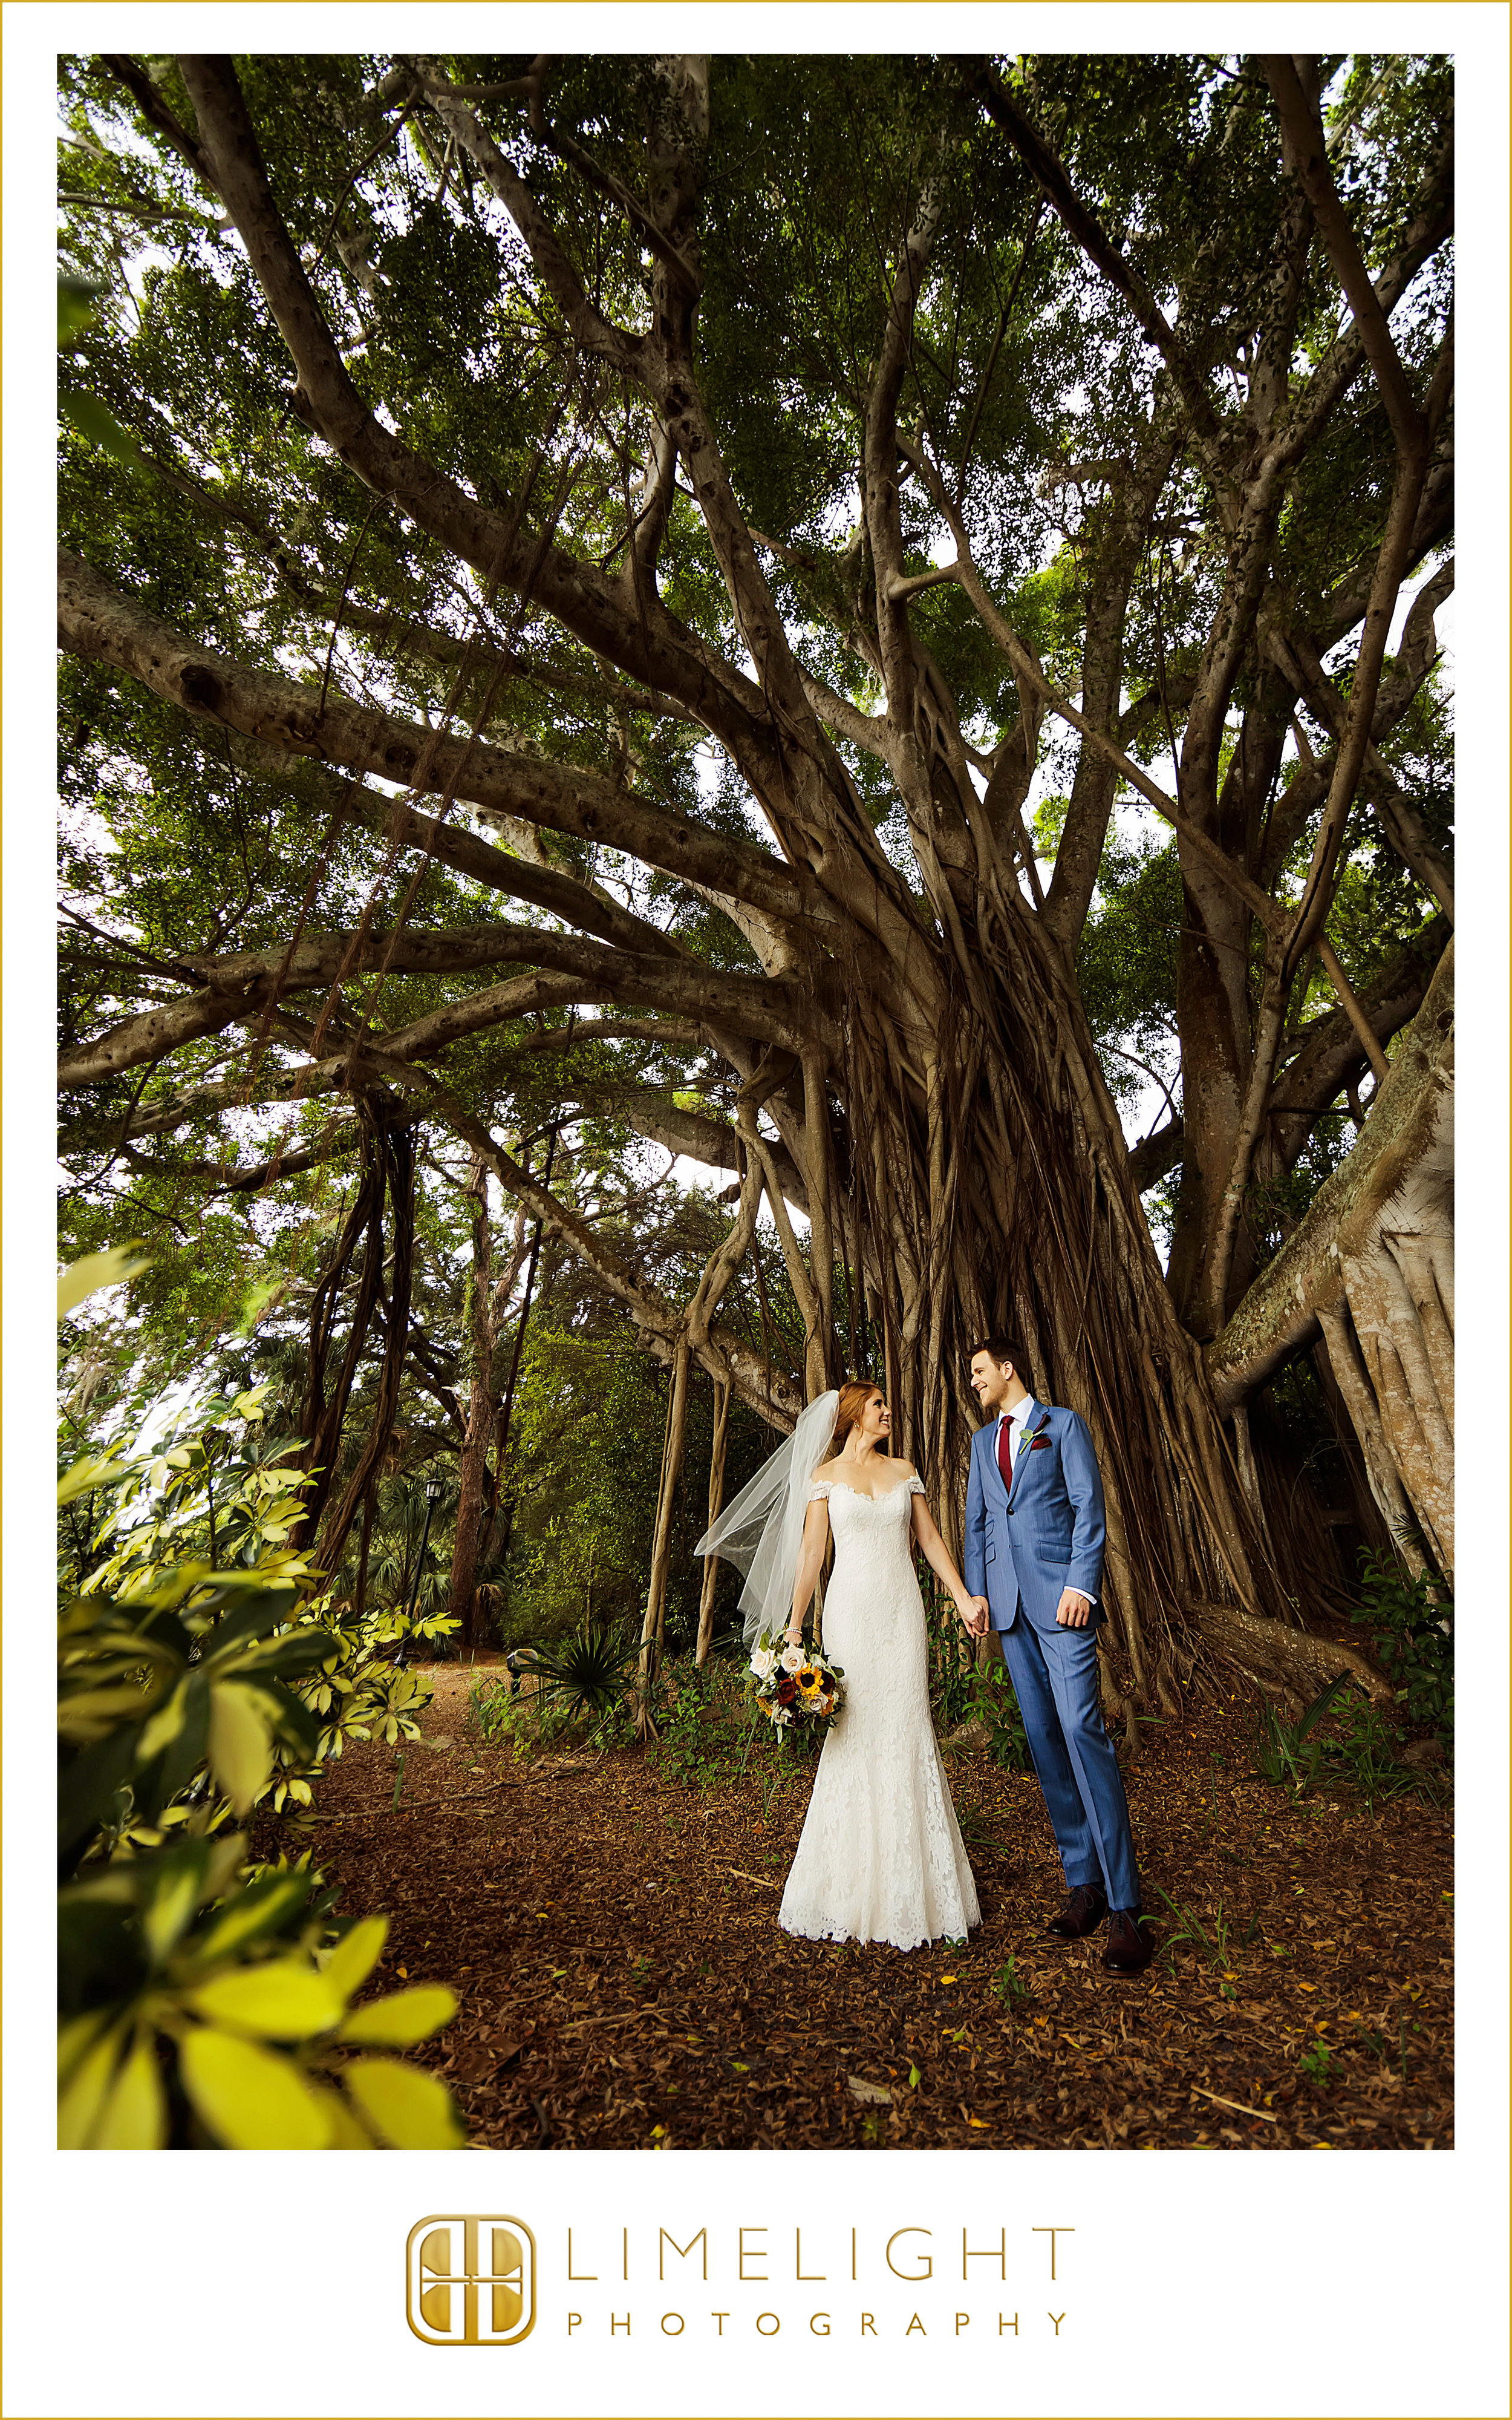 Copy of Portraits | Mr. & Mrs. | Wedding